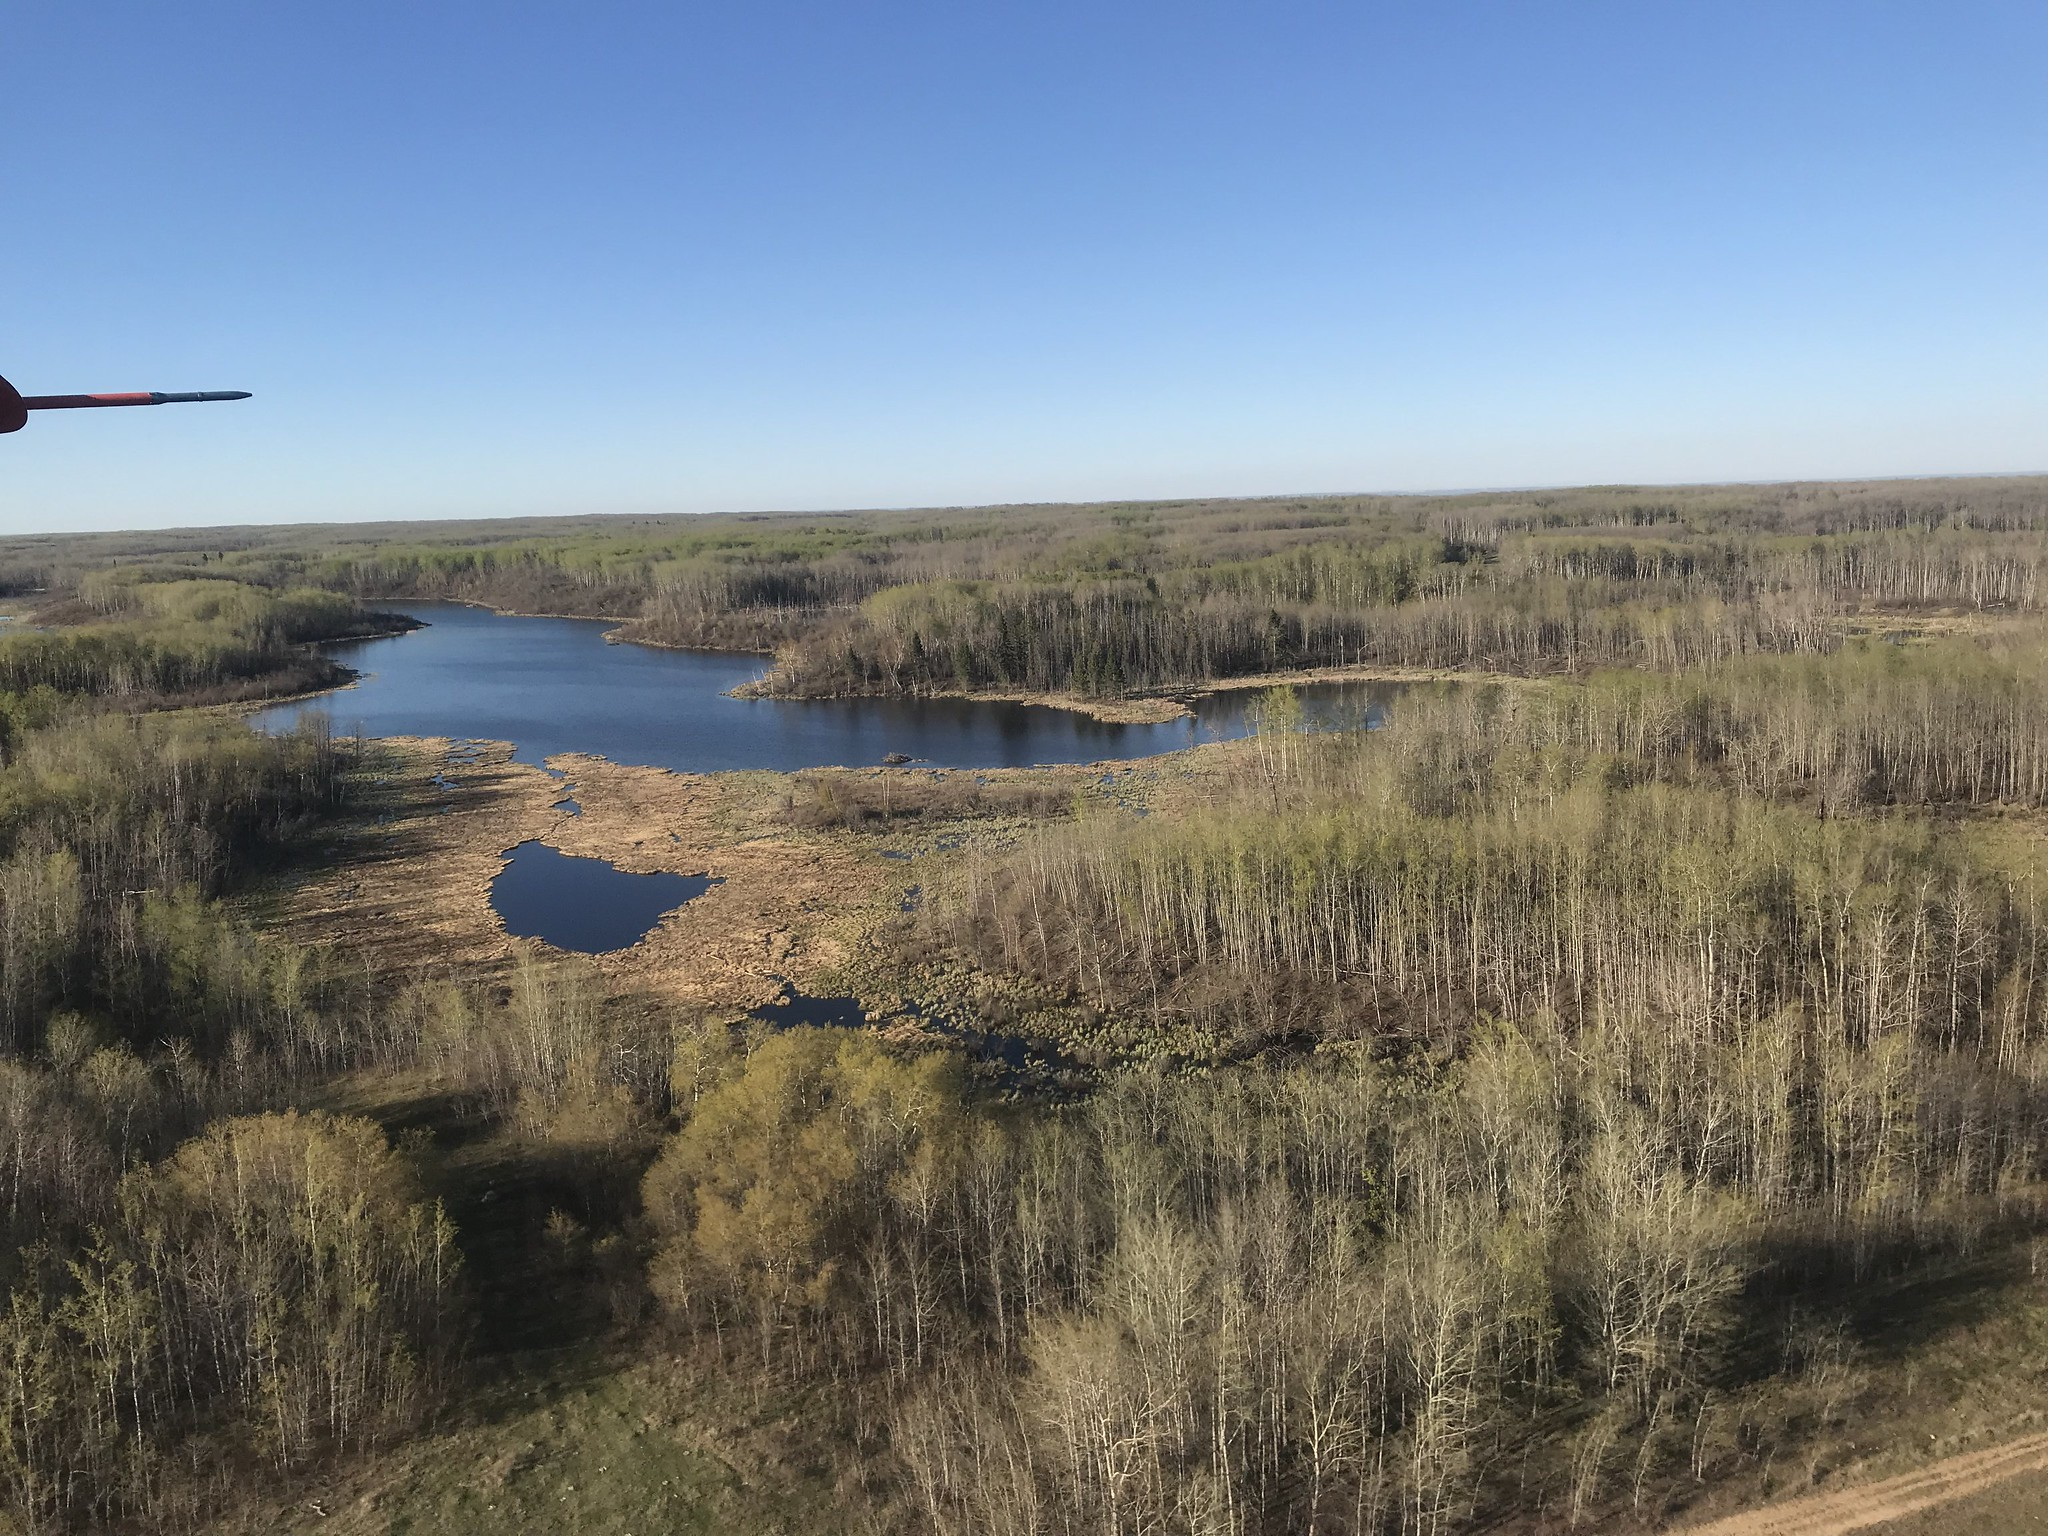 May 2019. Parkland wetland habitat, USFWS